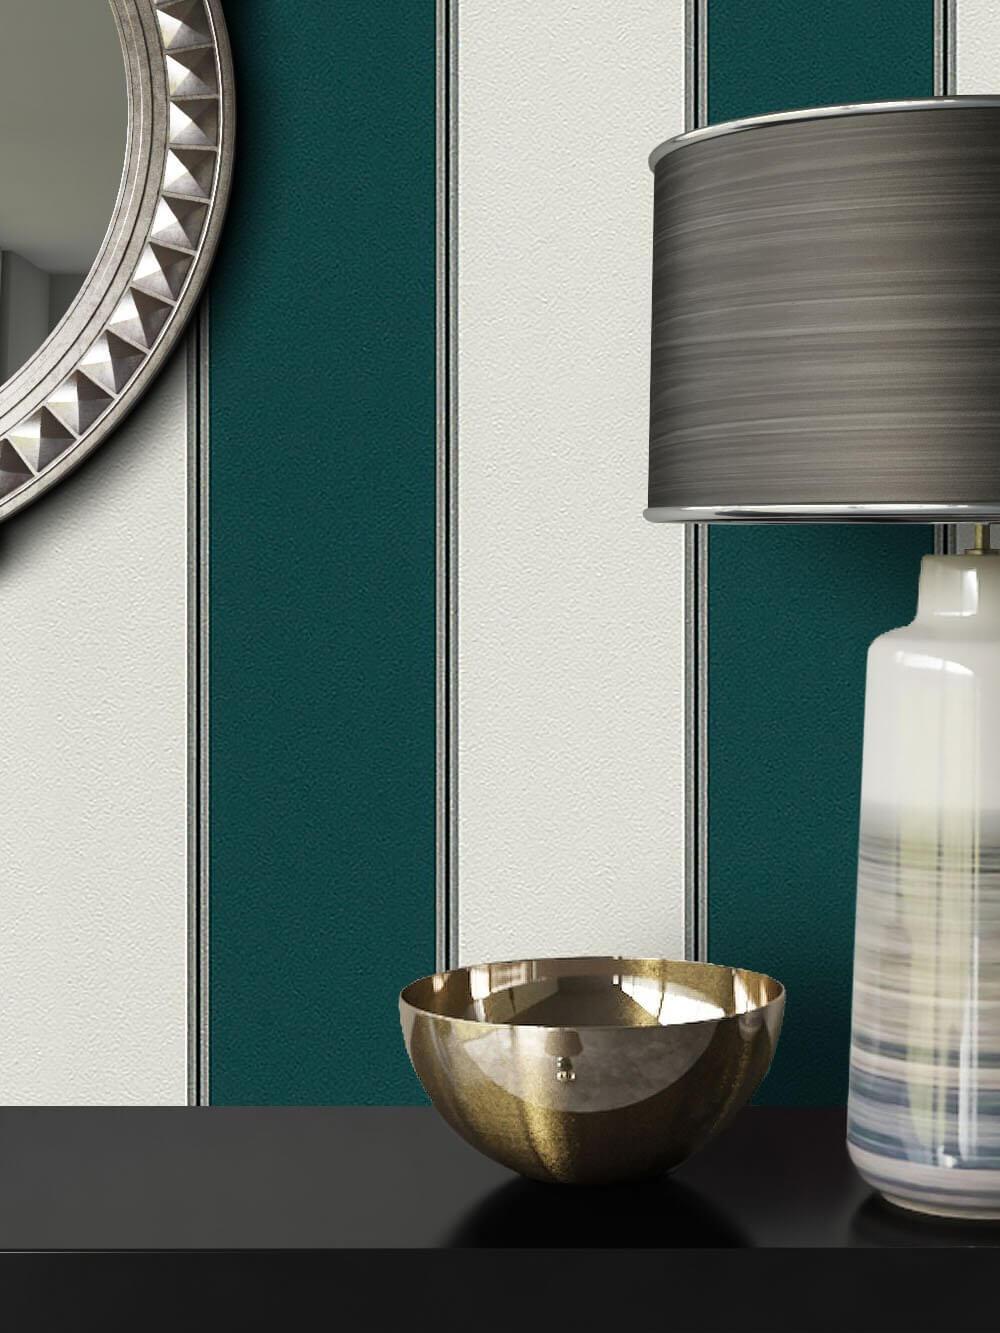 vliestapete gr n grafik diele flur schlafen. Black Bedroom Furniture Sets. Home Design Ideas